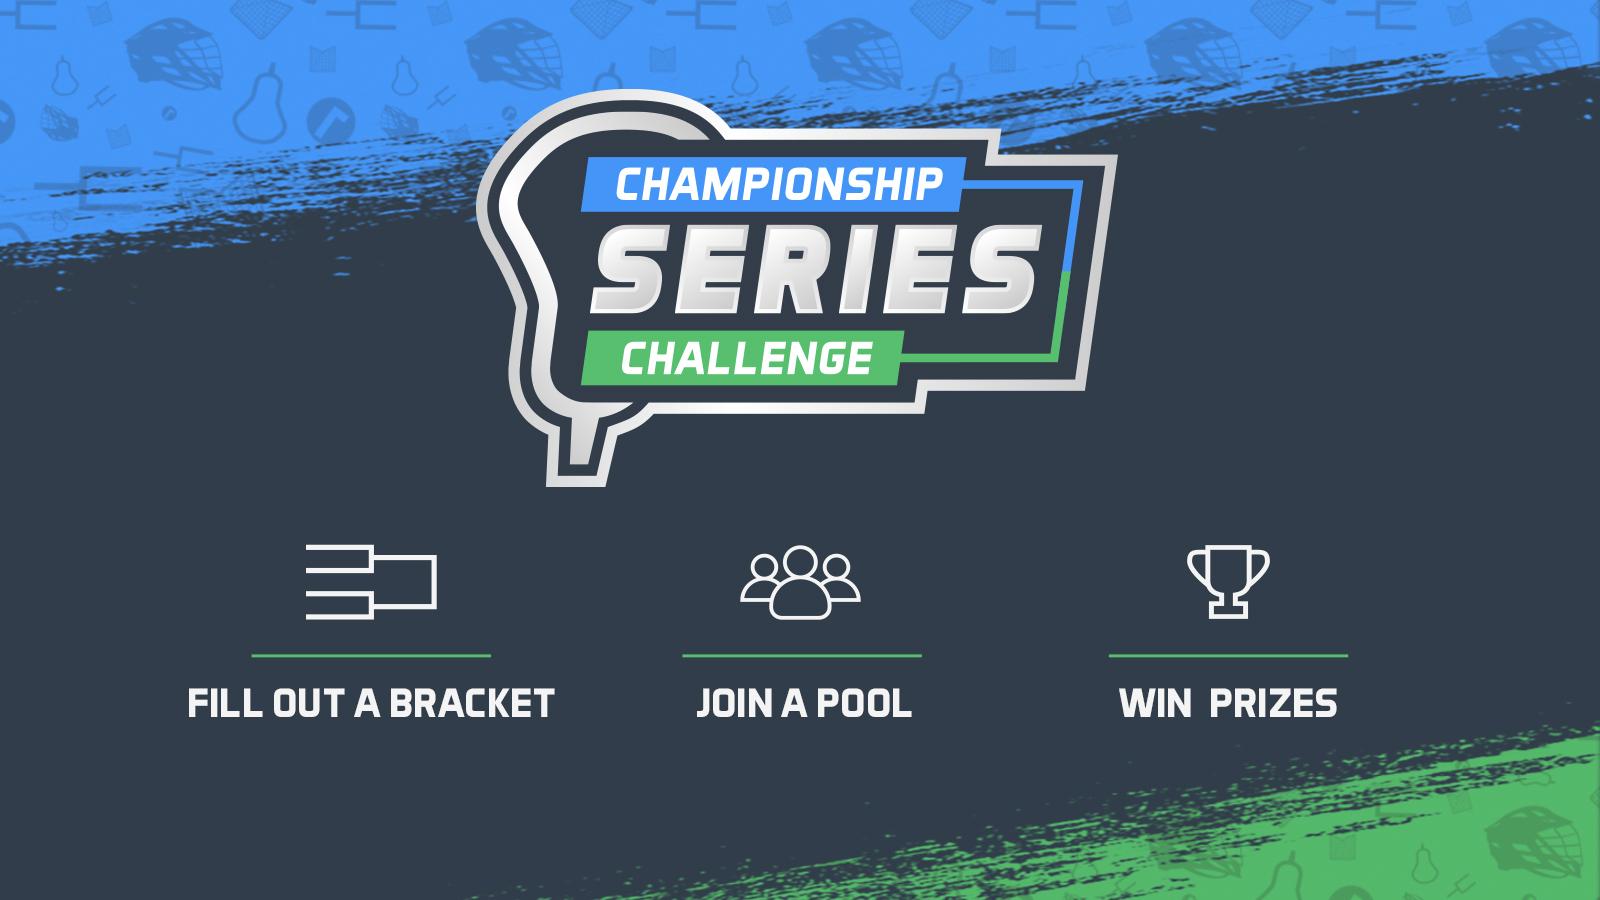 Championship Series Challenge.jpg